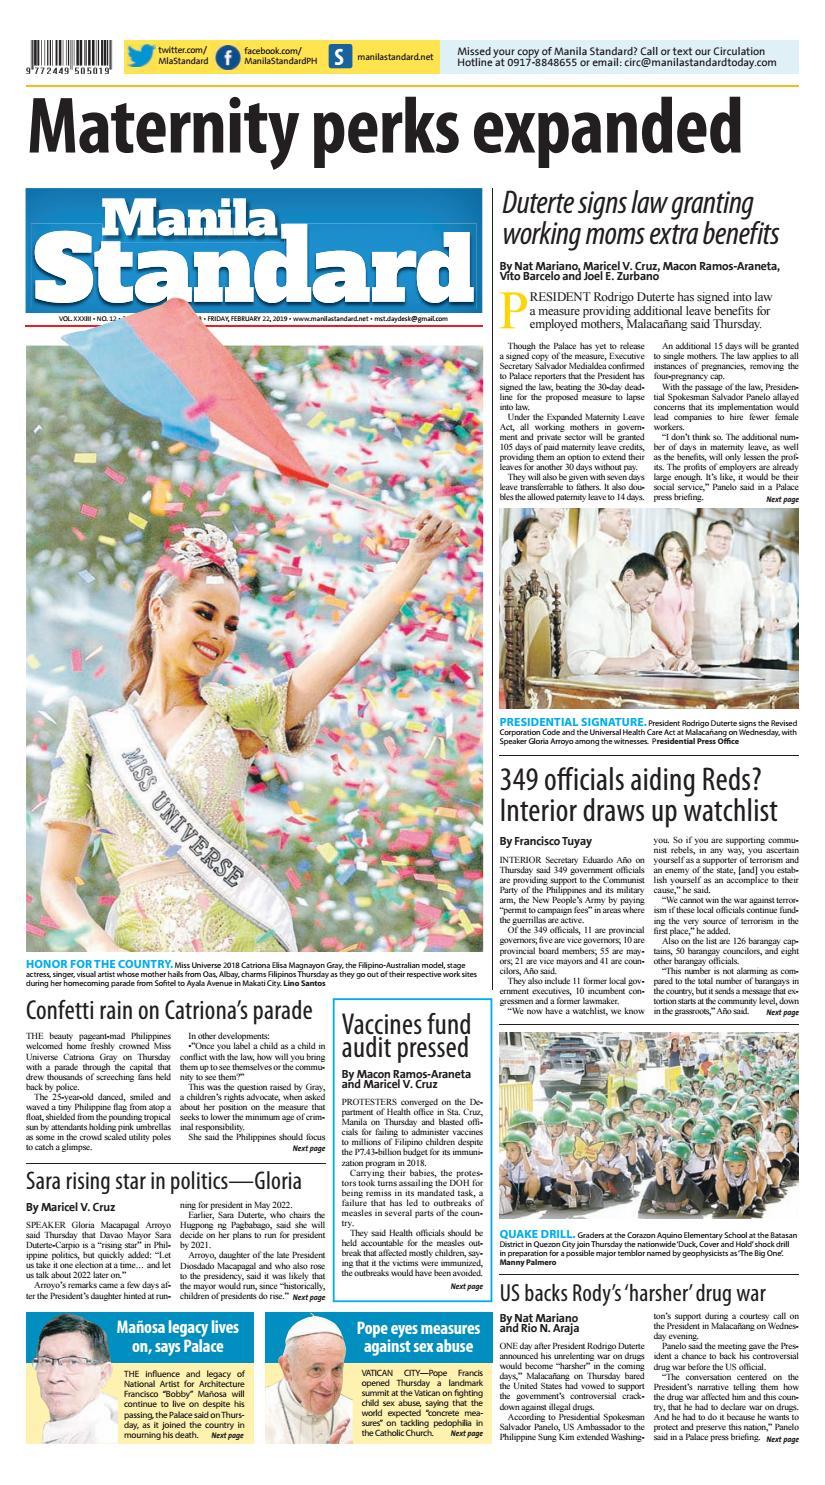 Manila Standard - 2019 February 22 - Friday by Manila Standard - issuu